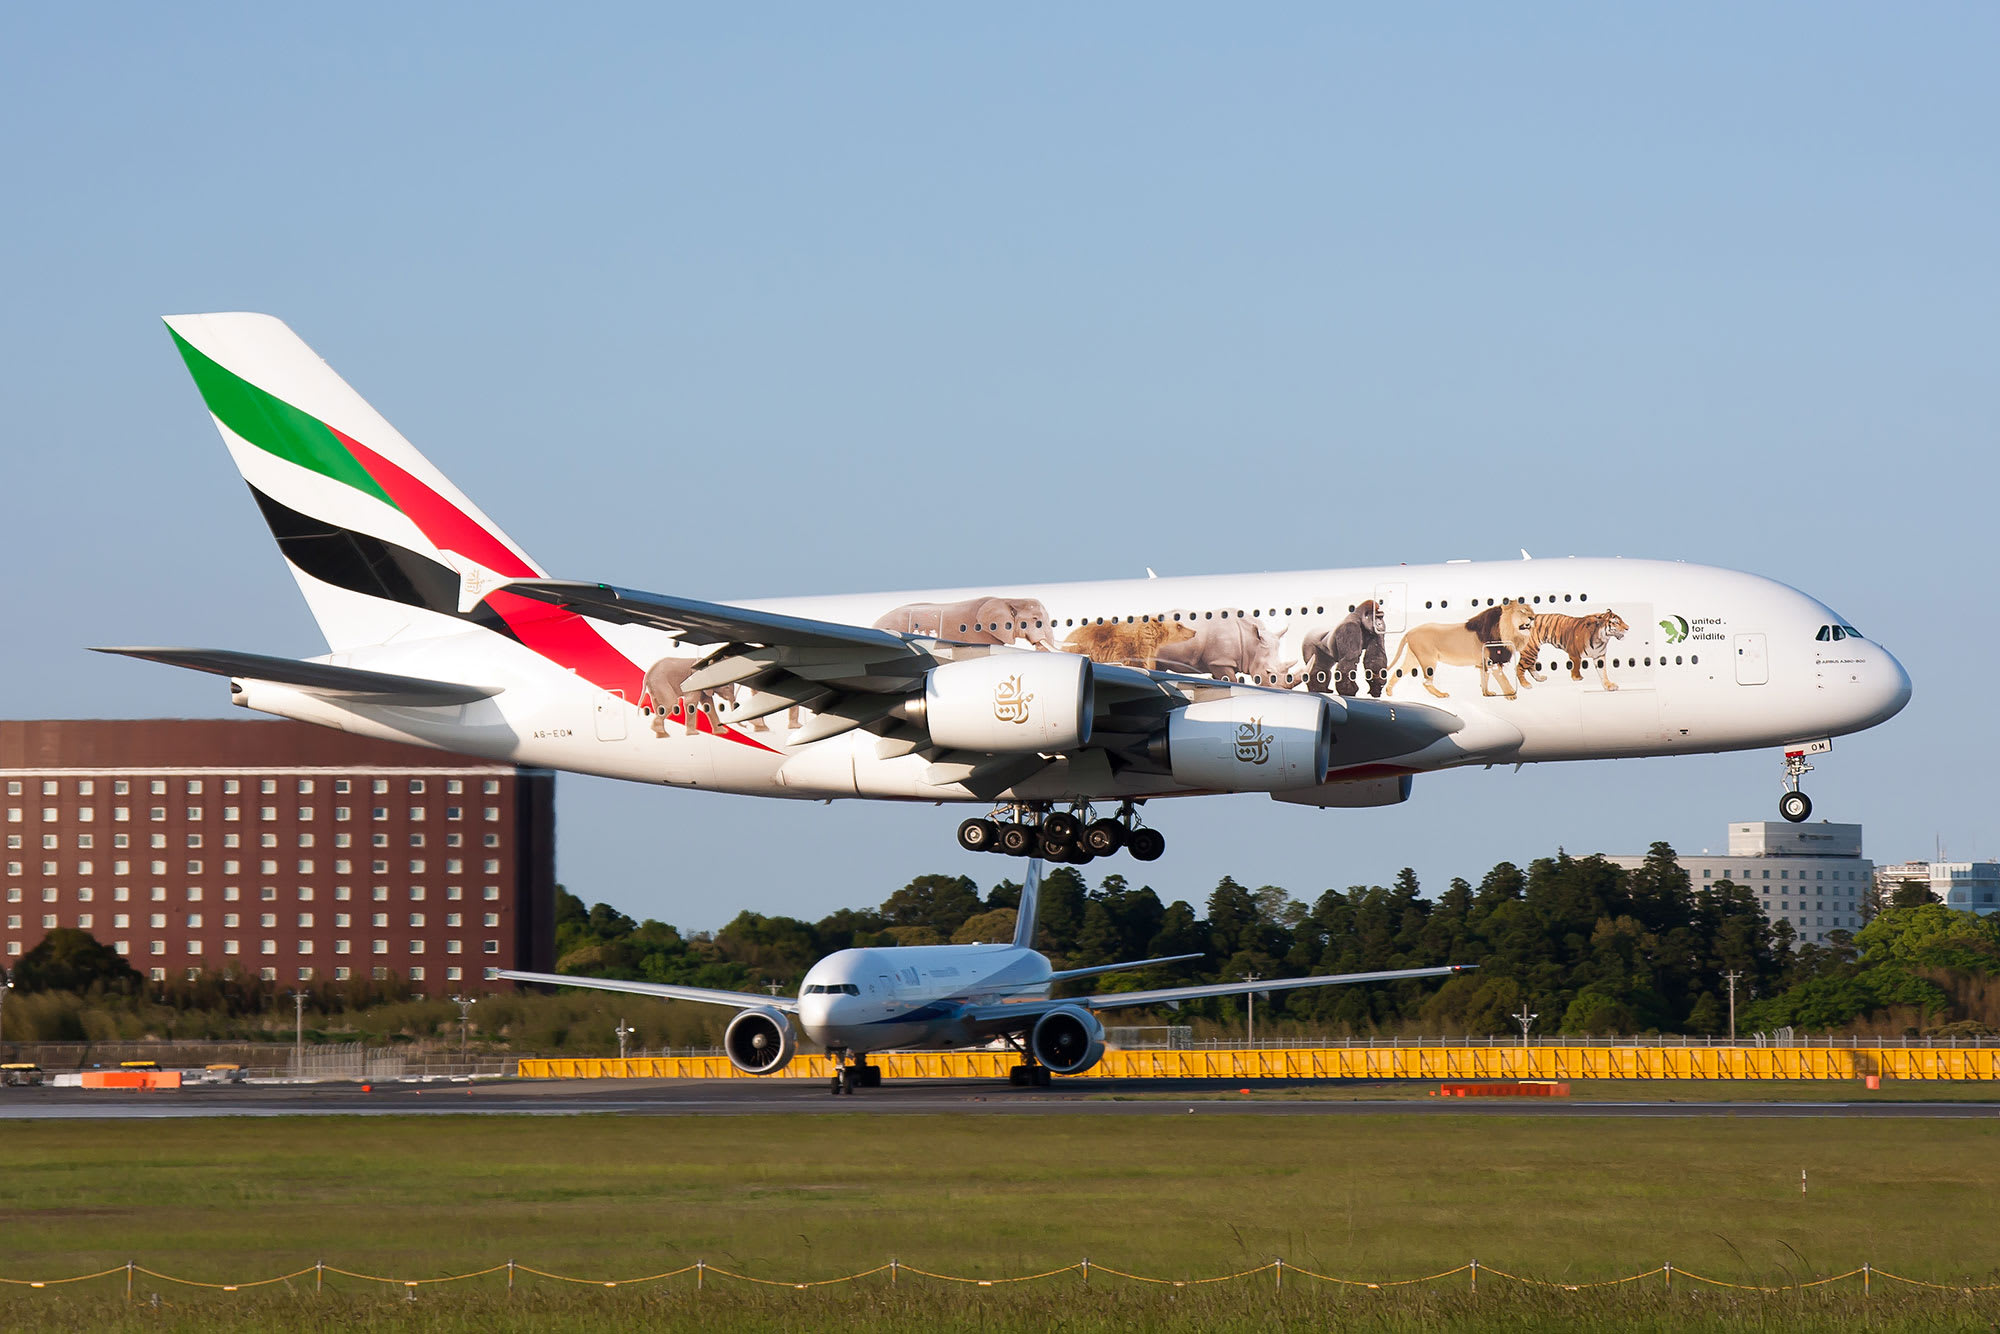 Emirates eyes return to profitability in 2022 as new journey corridors open